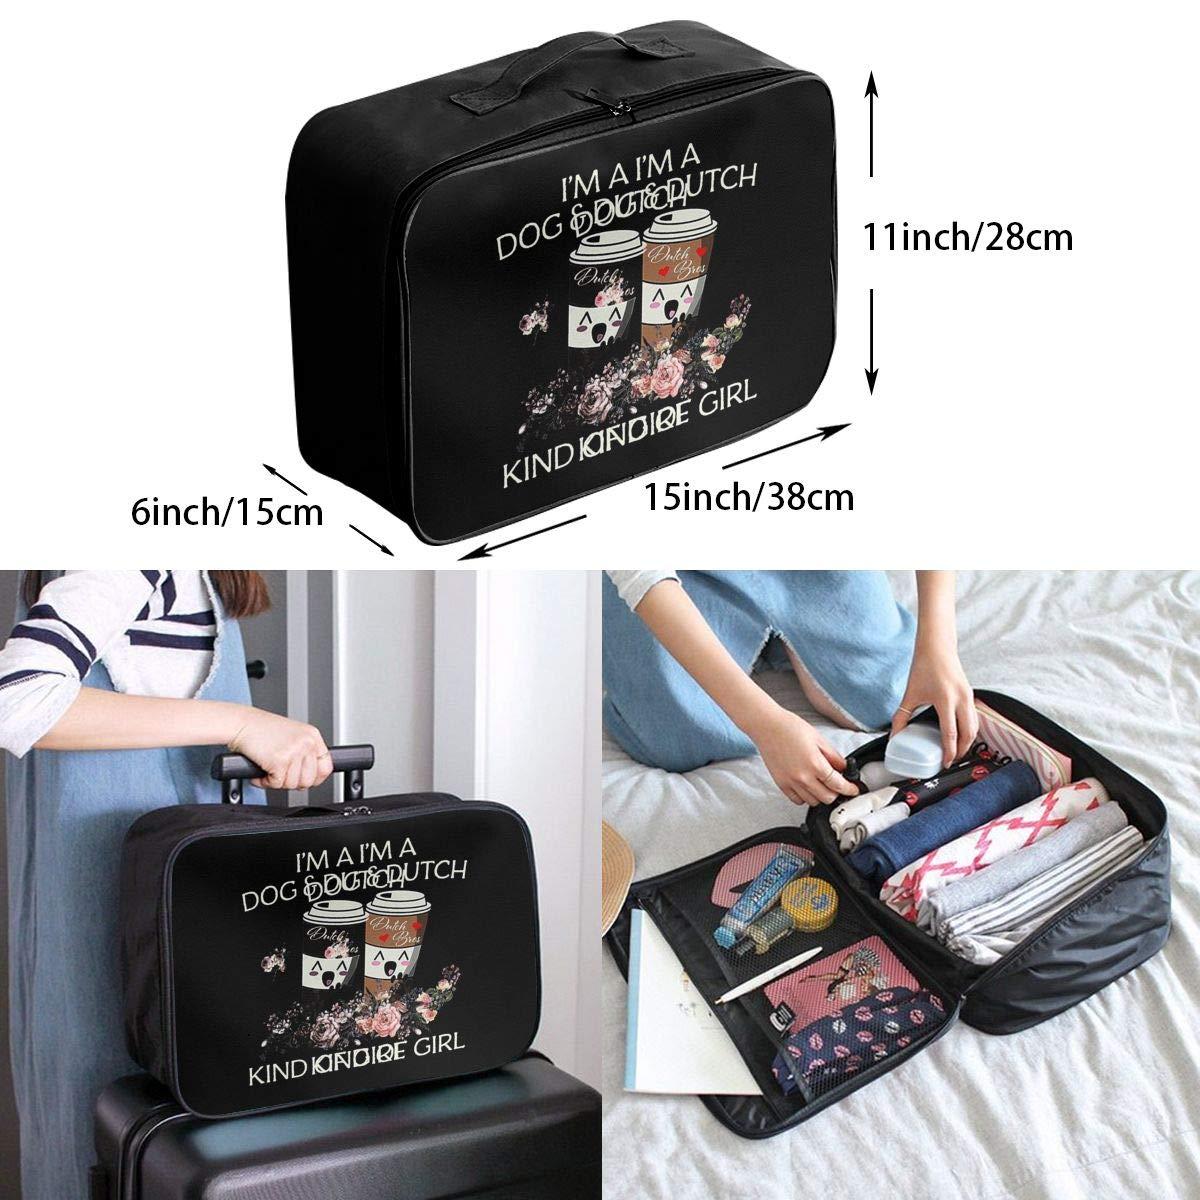 Fretlo Im A Dog Dutch Travel Duffel Bag Waterproof Lightweight Large Capacity Portable Luggage Bag Black